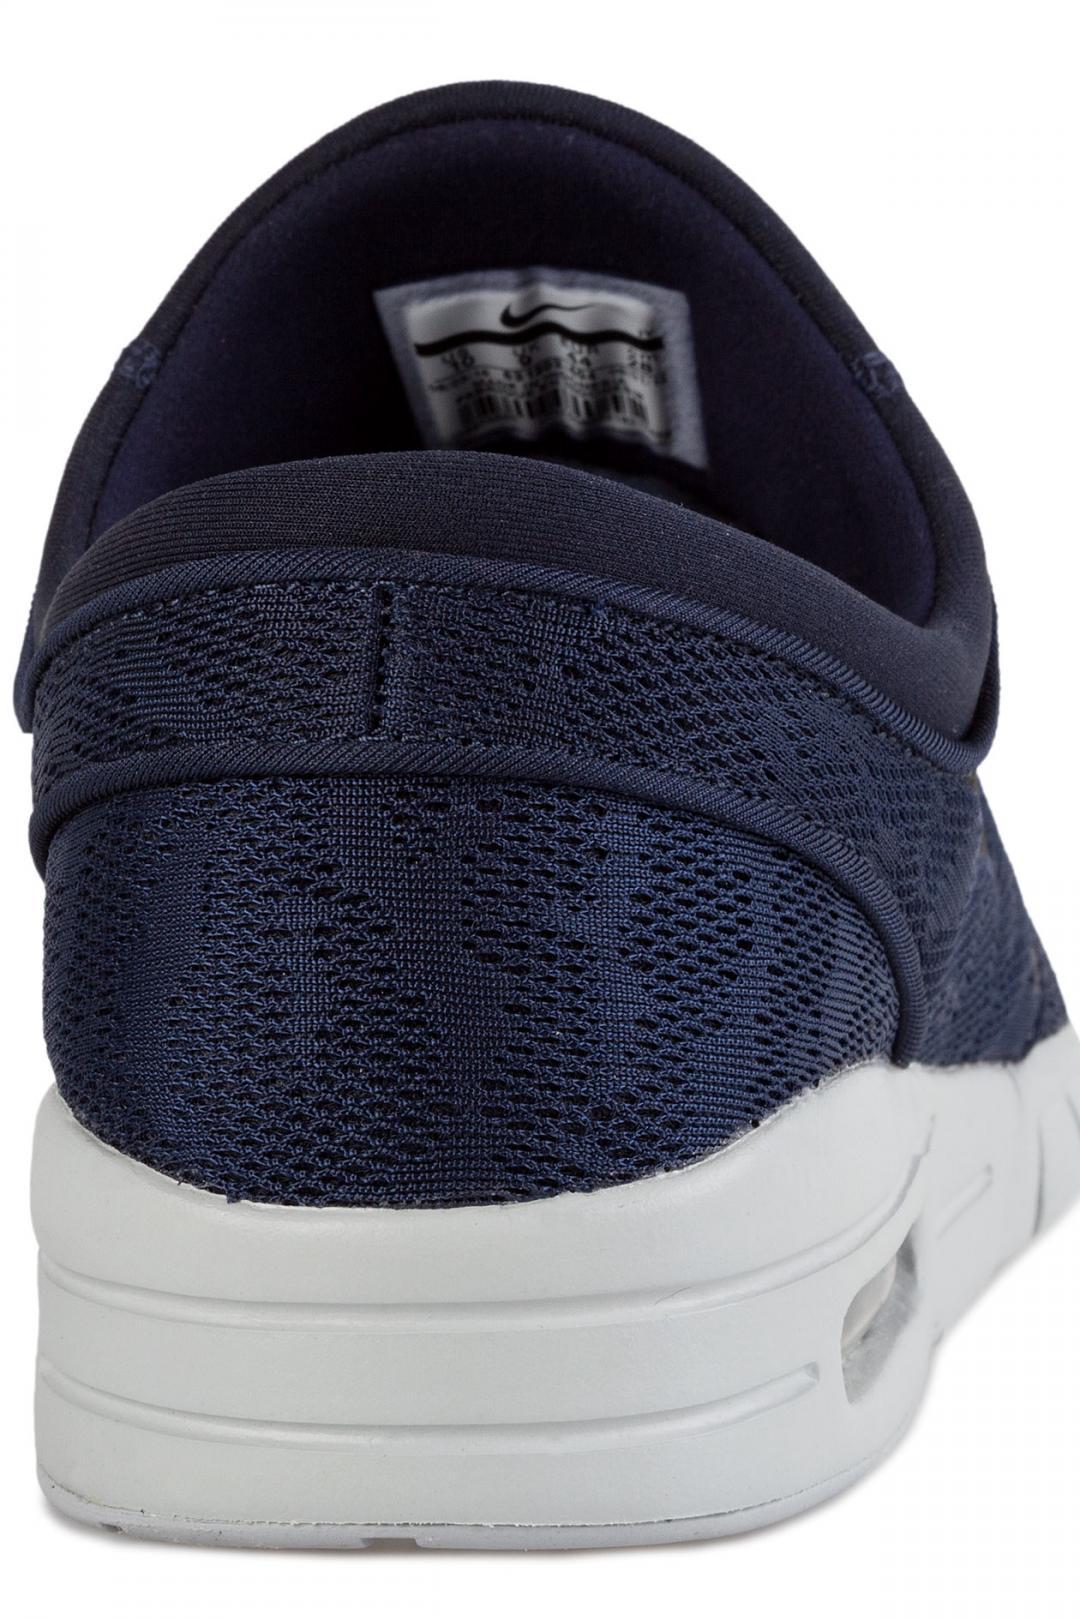 Uomo/Donna Nike SB Stefan Janoski Max obsidian black pure platinum | Sneaker